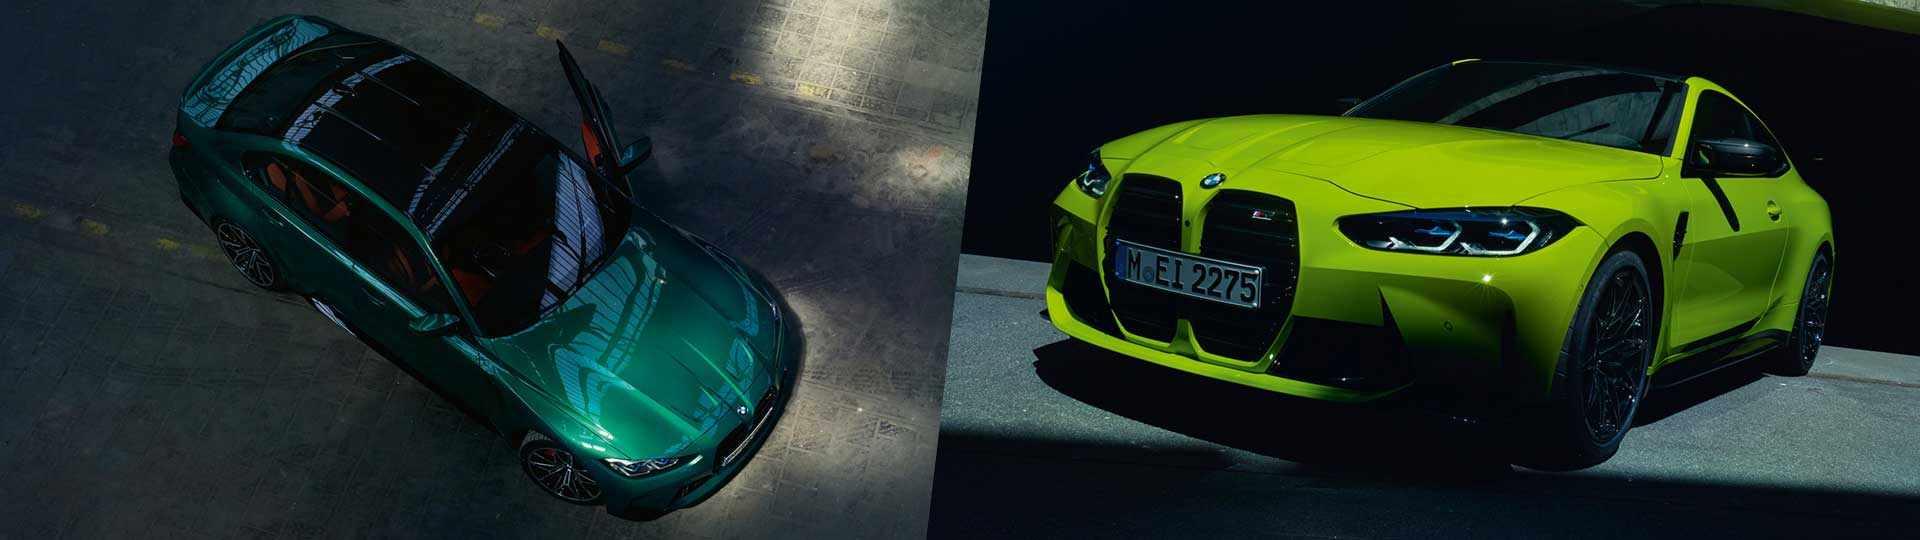 Nuova-BMW-M3-e-M4-min.jpg